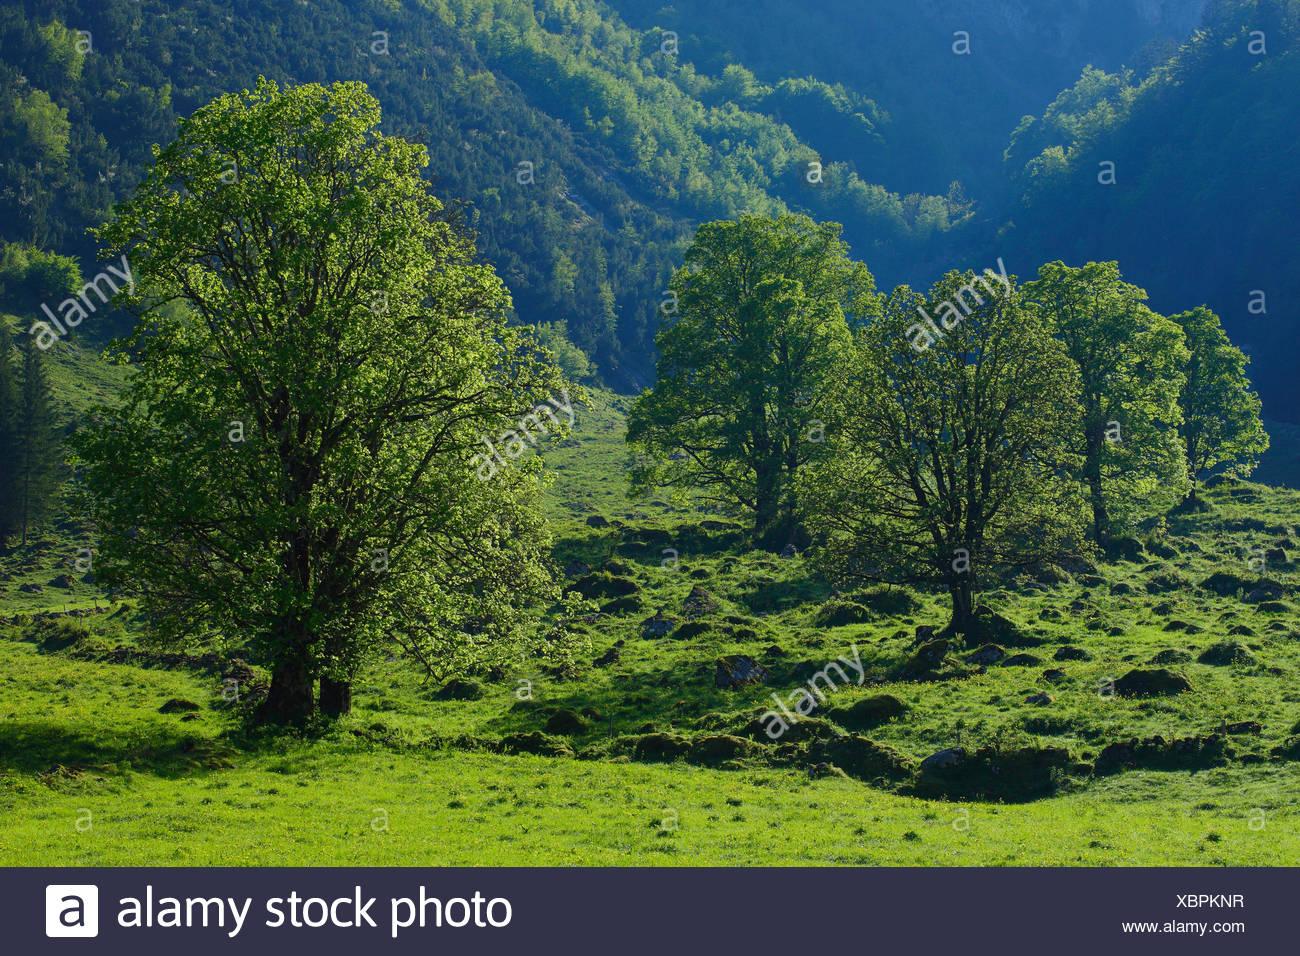 Acer pseudoplatanus, maple, tree, mountain, sycamore, mountains, trees, spring, mountains, canton Glarus, Switzerland, green Stock Photo